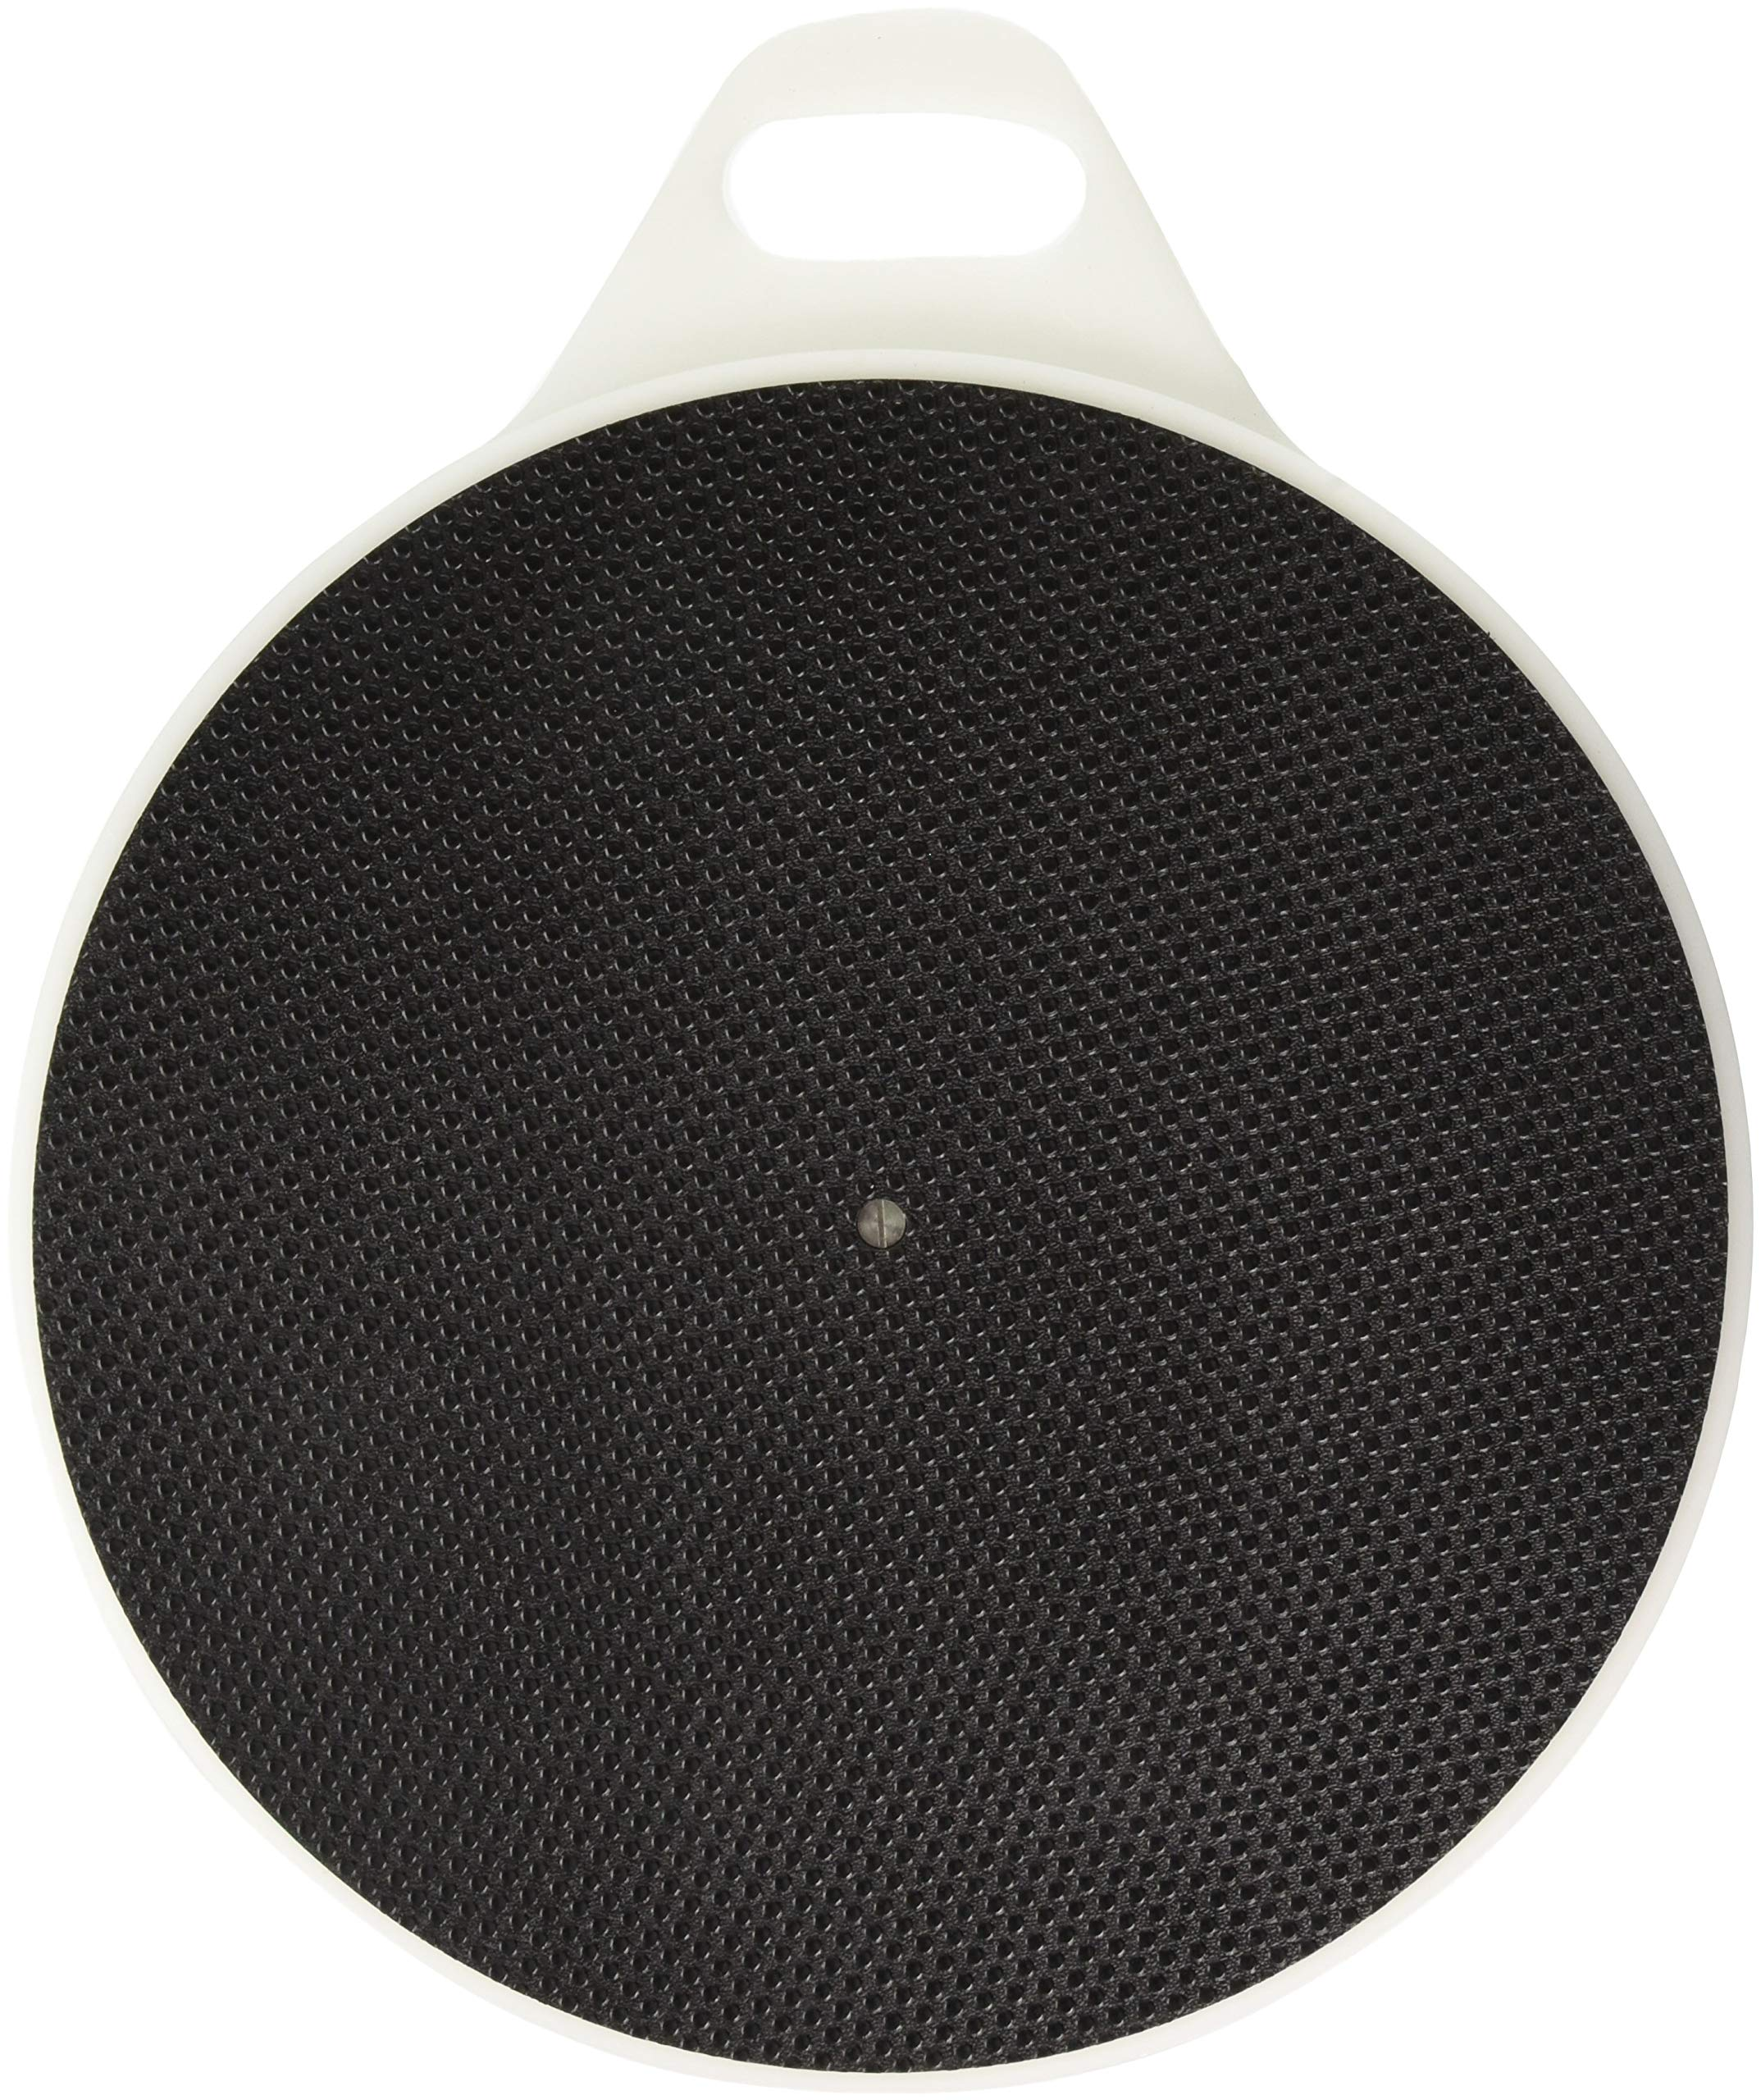 Safetysure Pivot Disc 13 inches